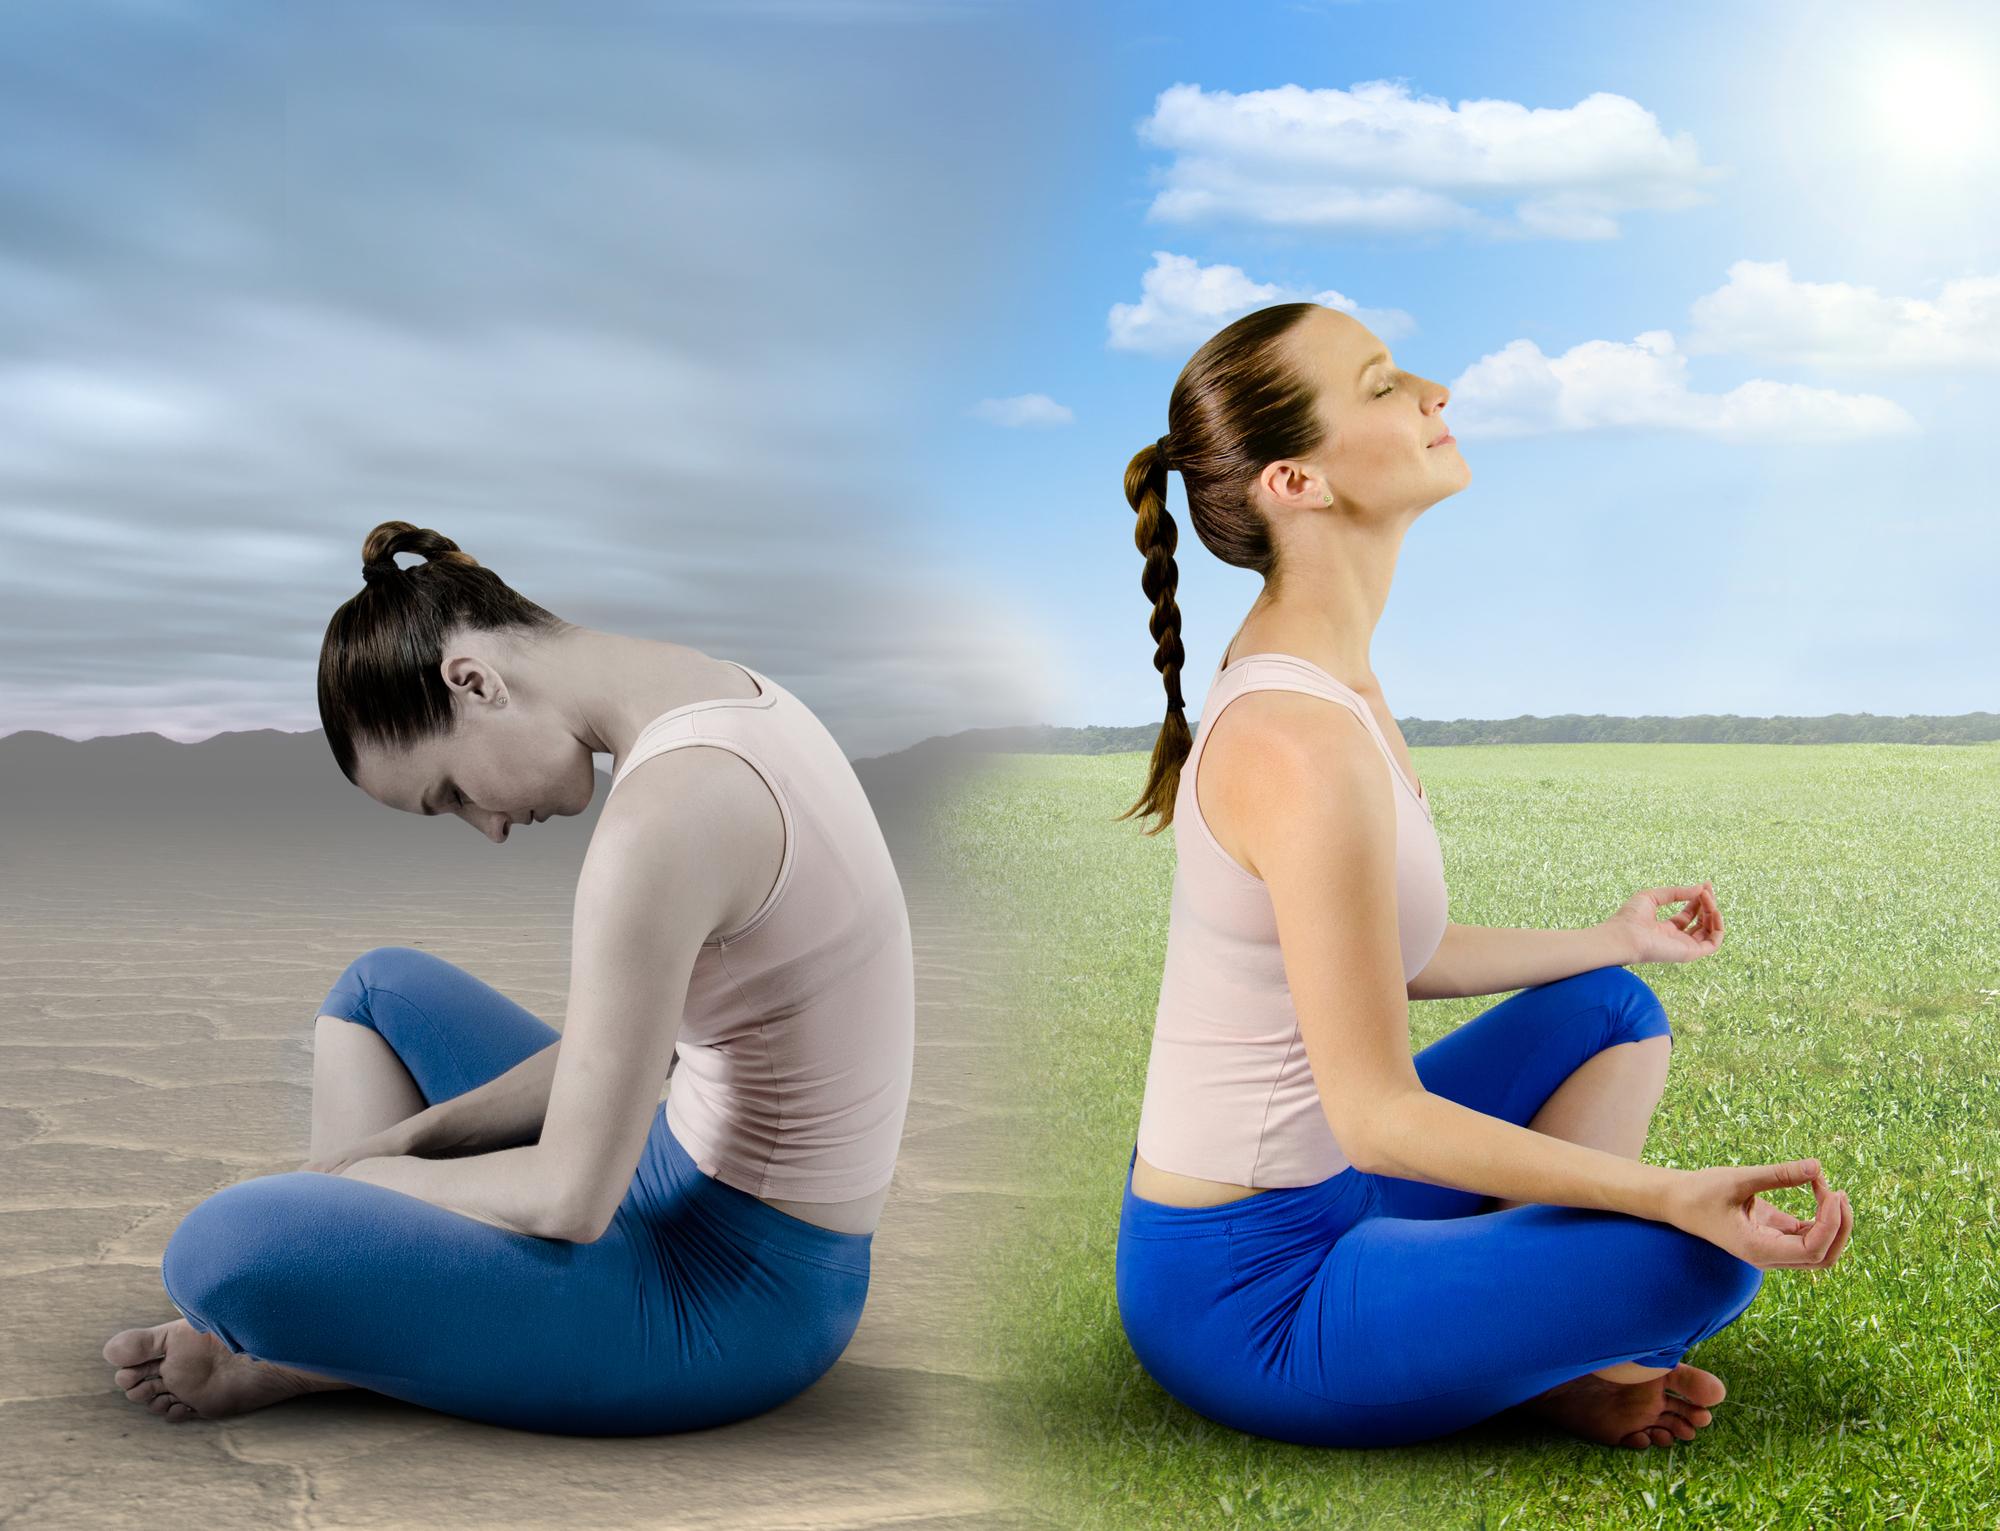 A women feels happier after meditating